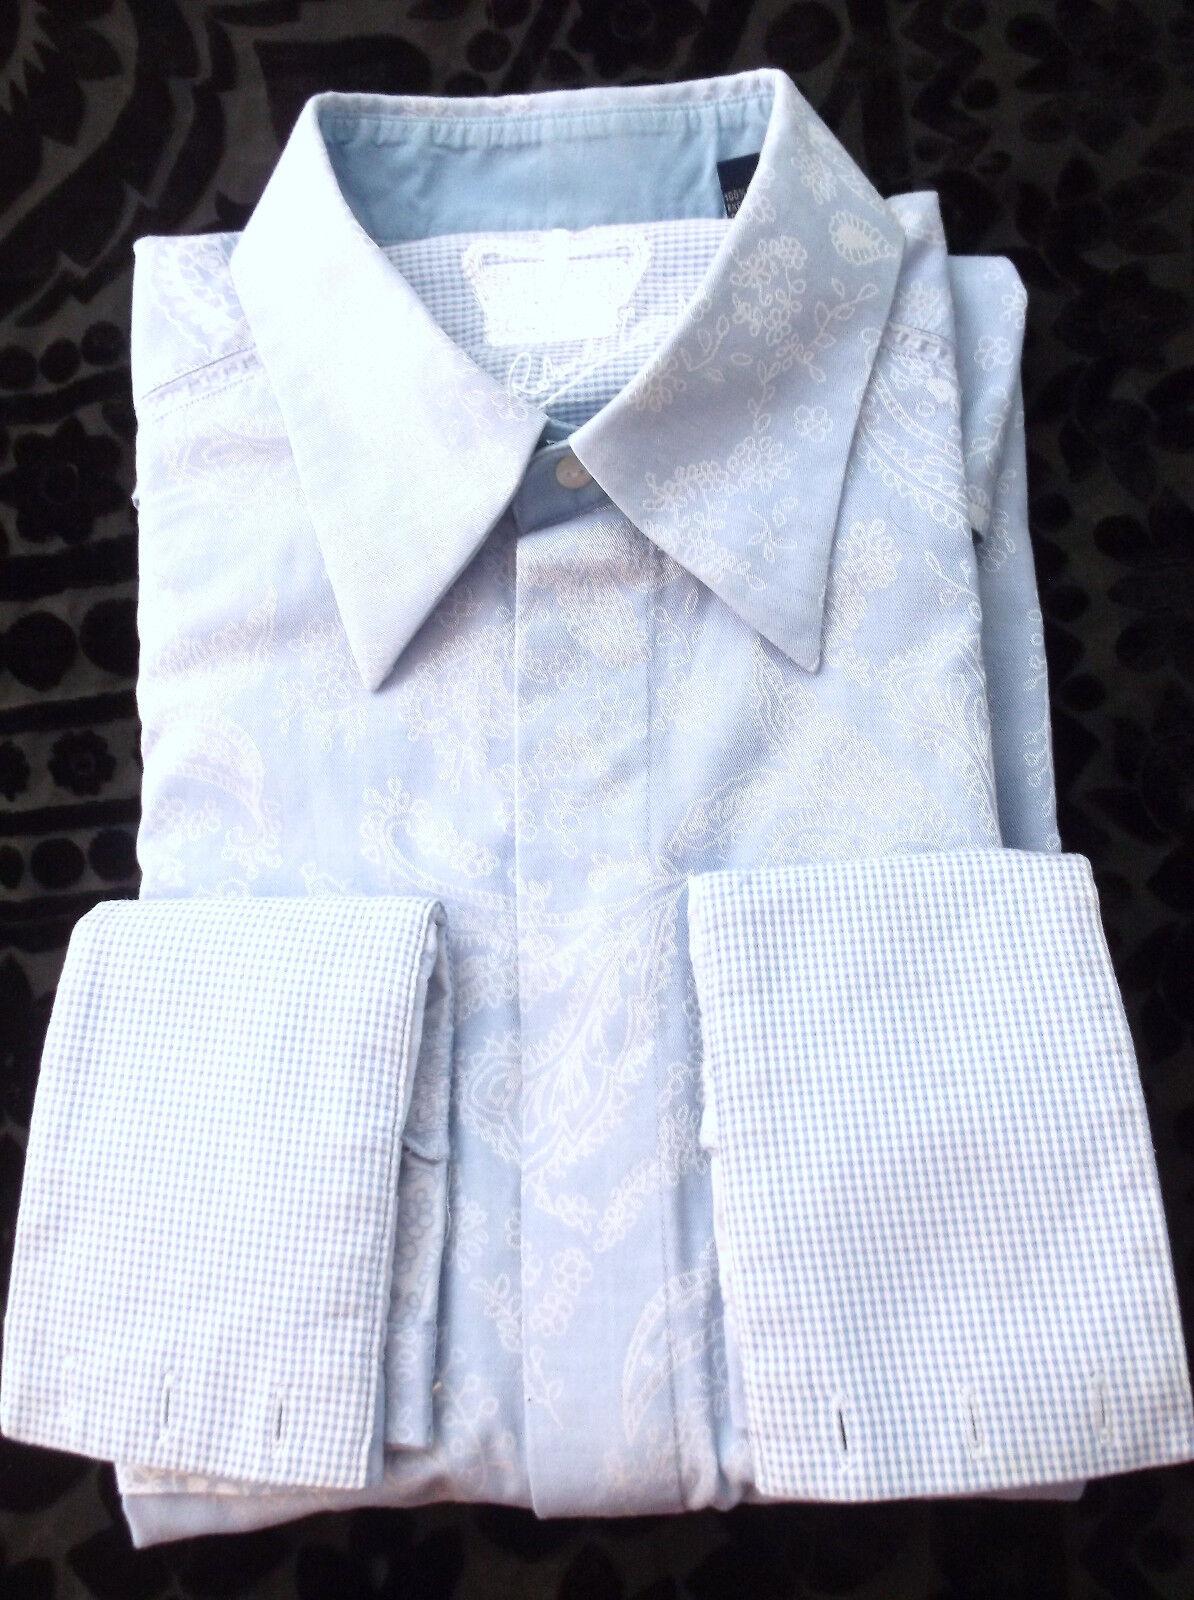 ROBERT GRAHAM Multi-Farbe Blau Paisley Shirt Blau Weiß Long Sleeve Größe XL/ TG